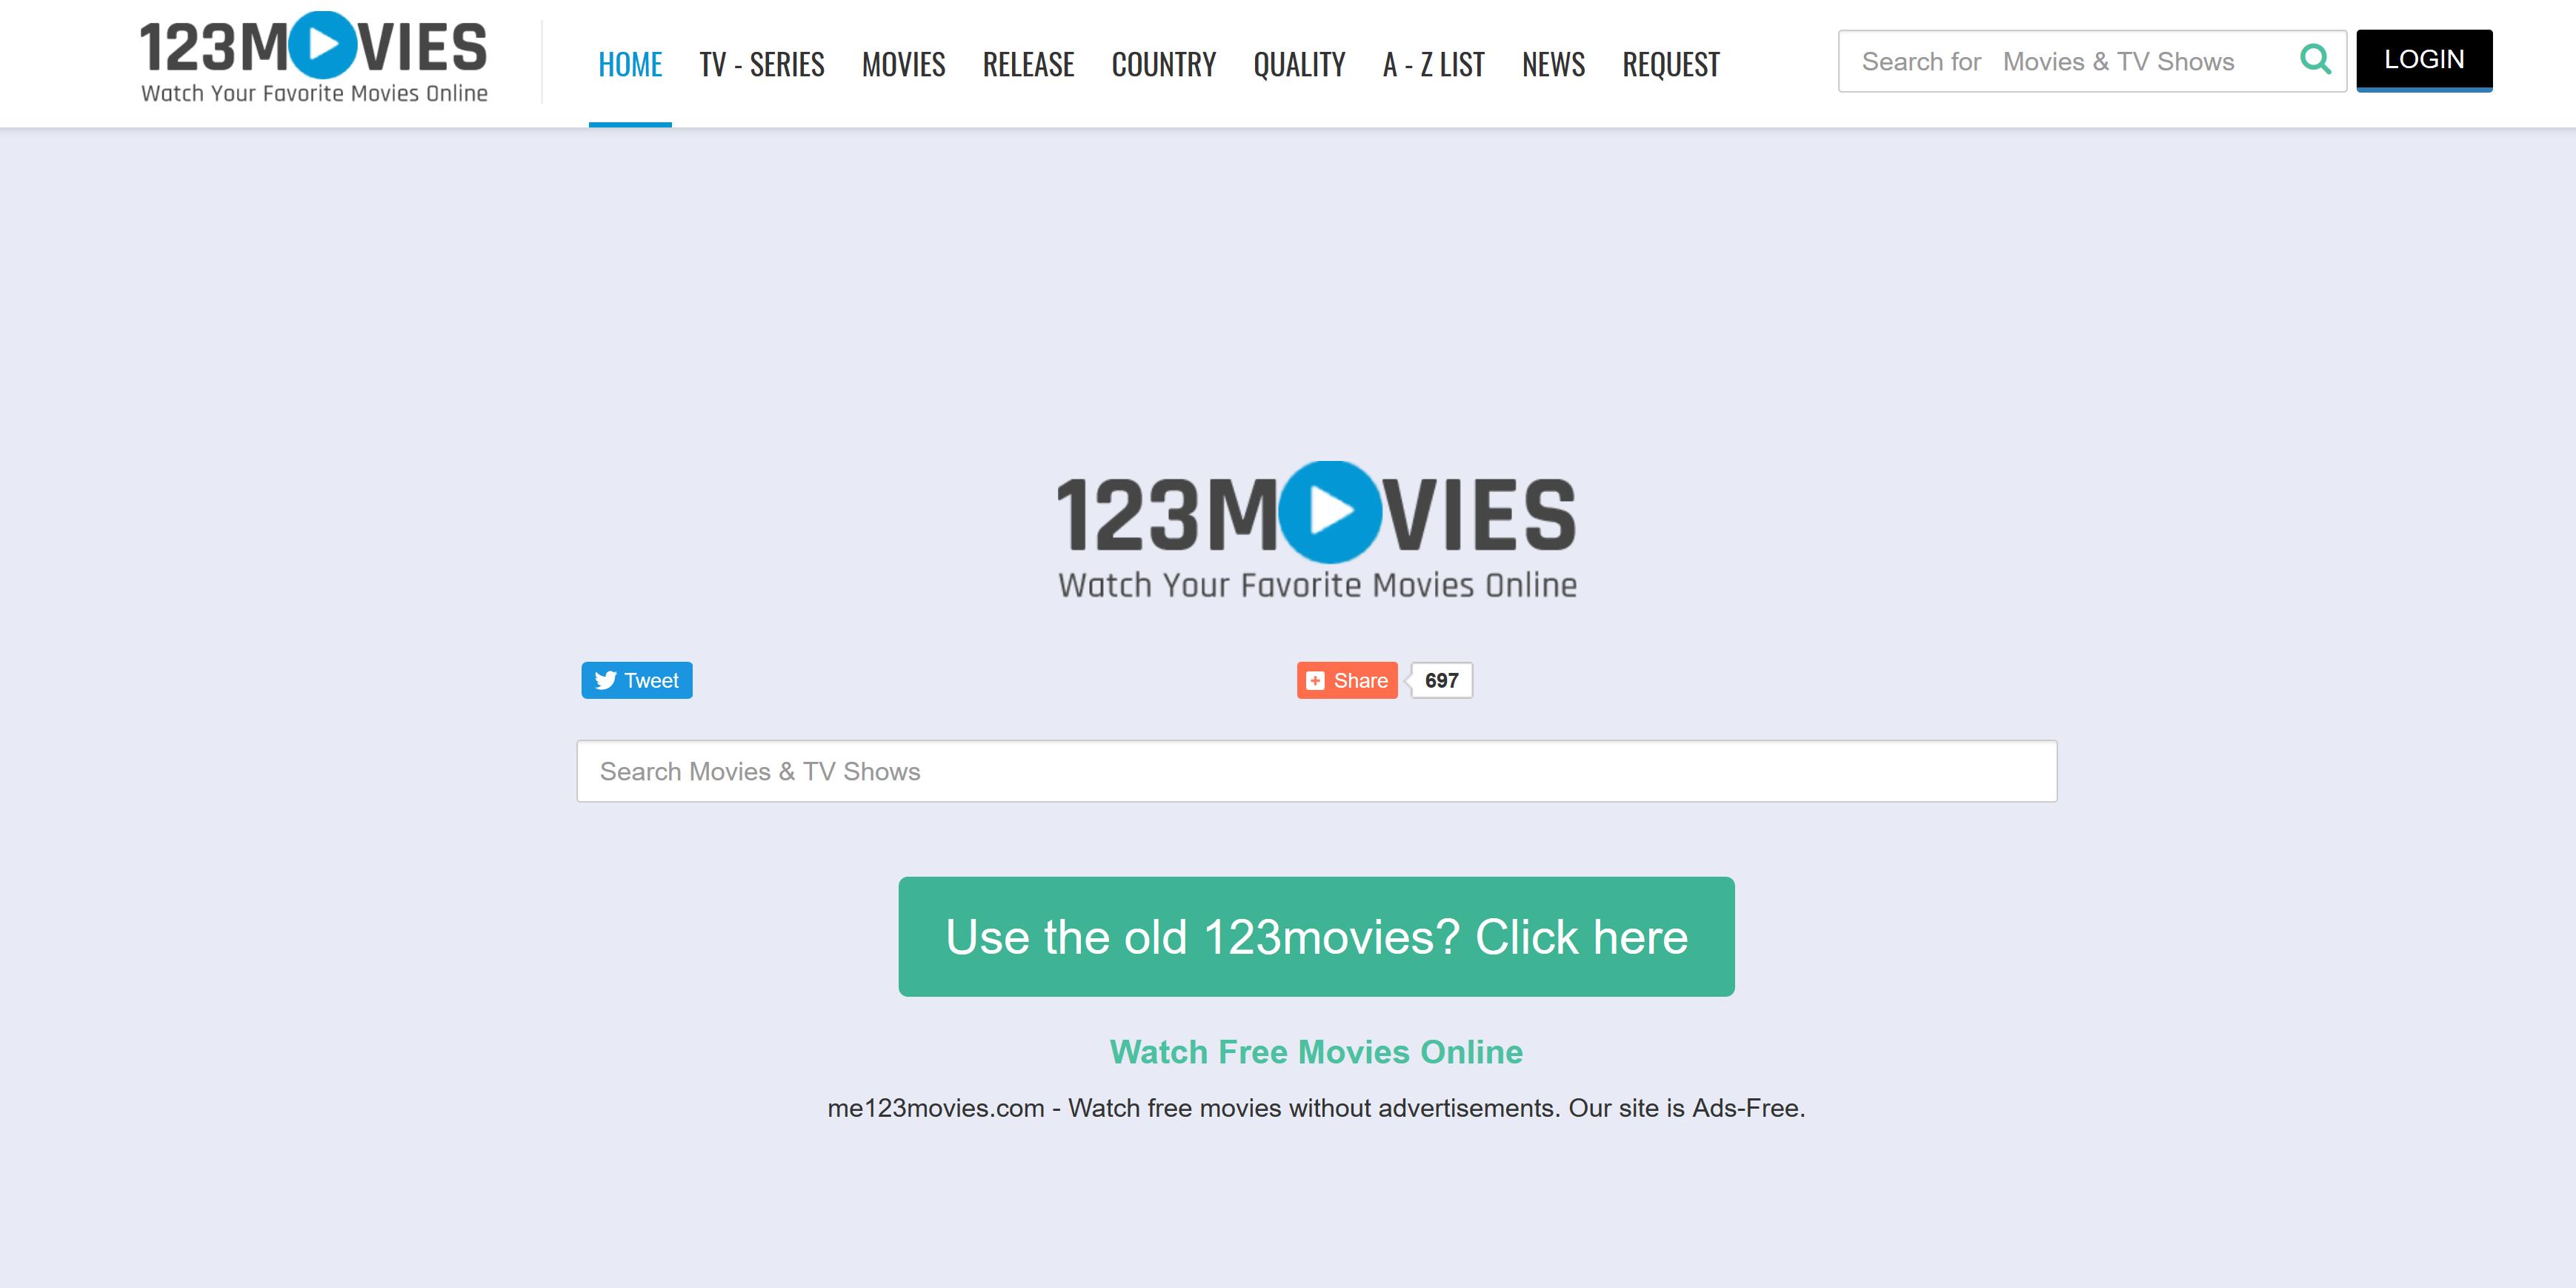 Top 123movies Alternative Is Nomoviesherecom 123movies